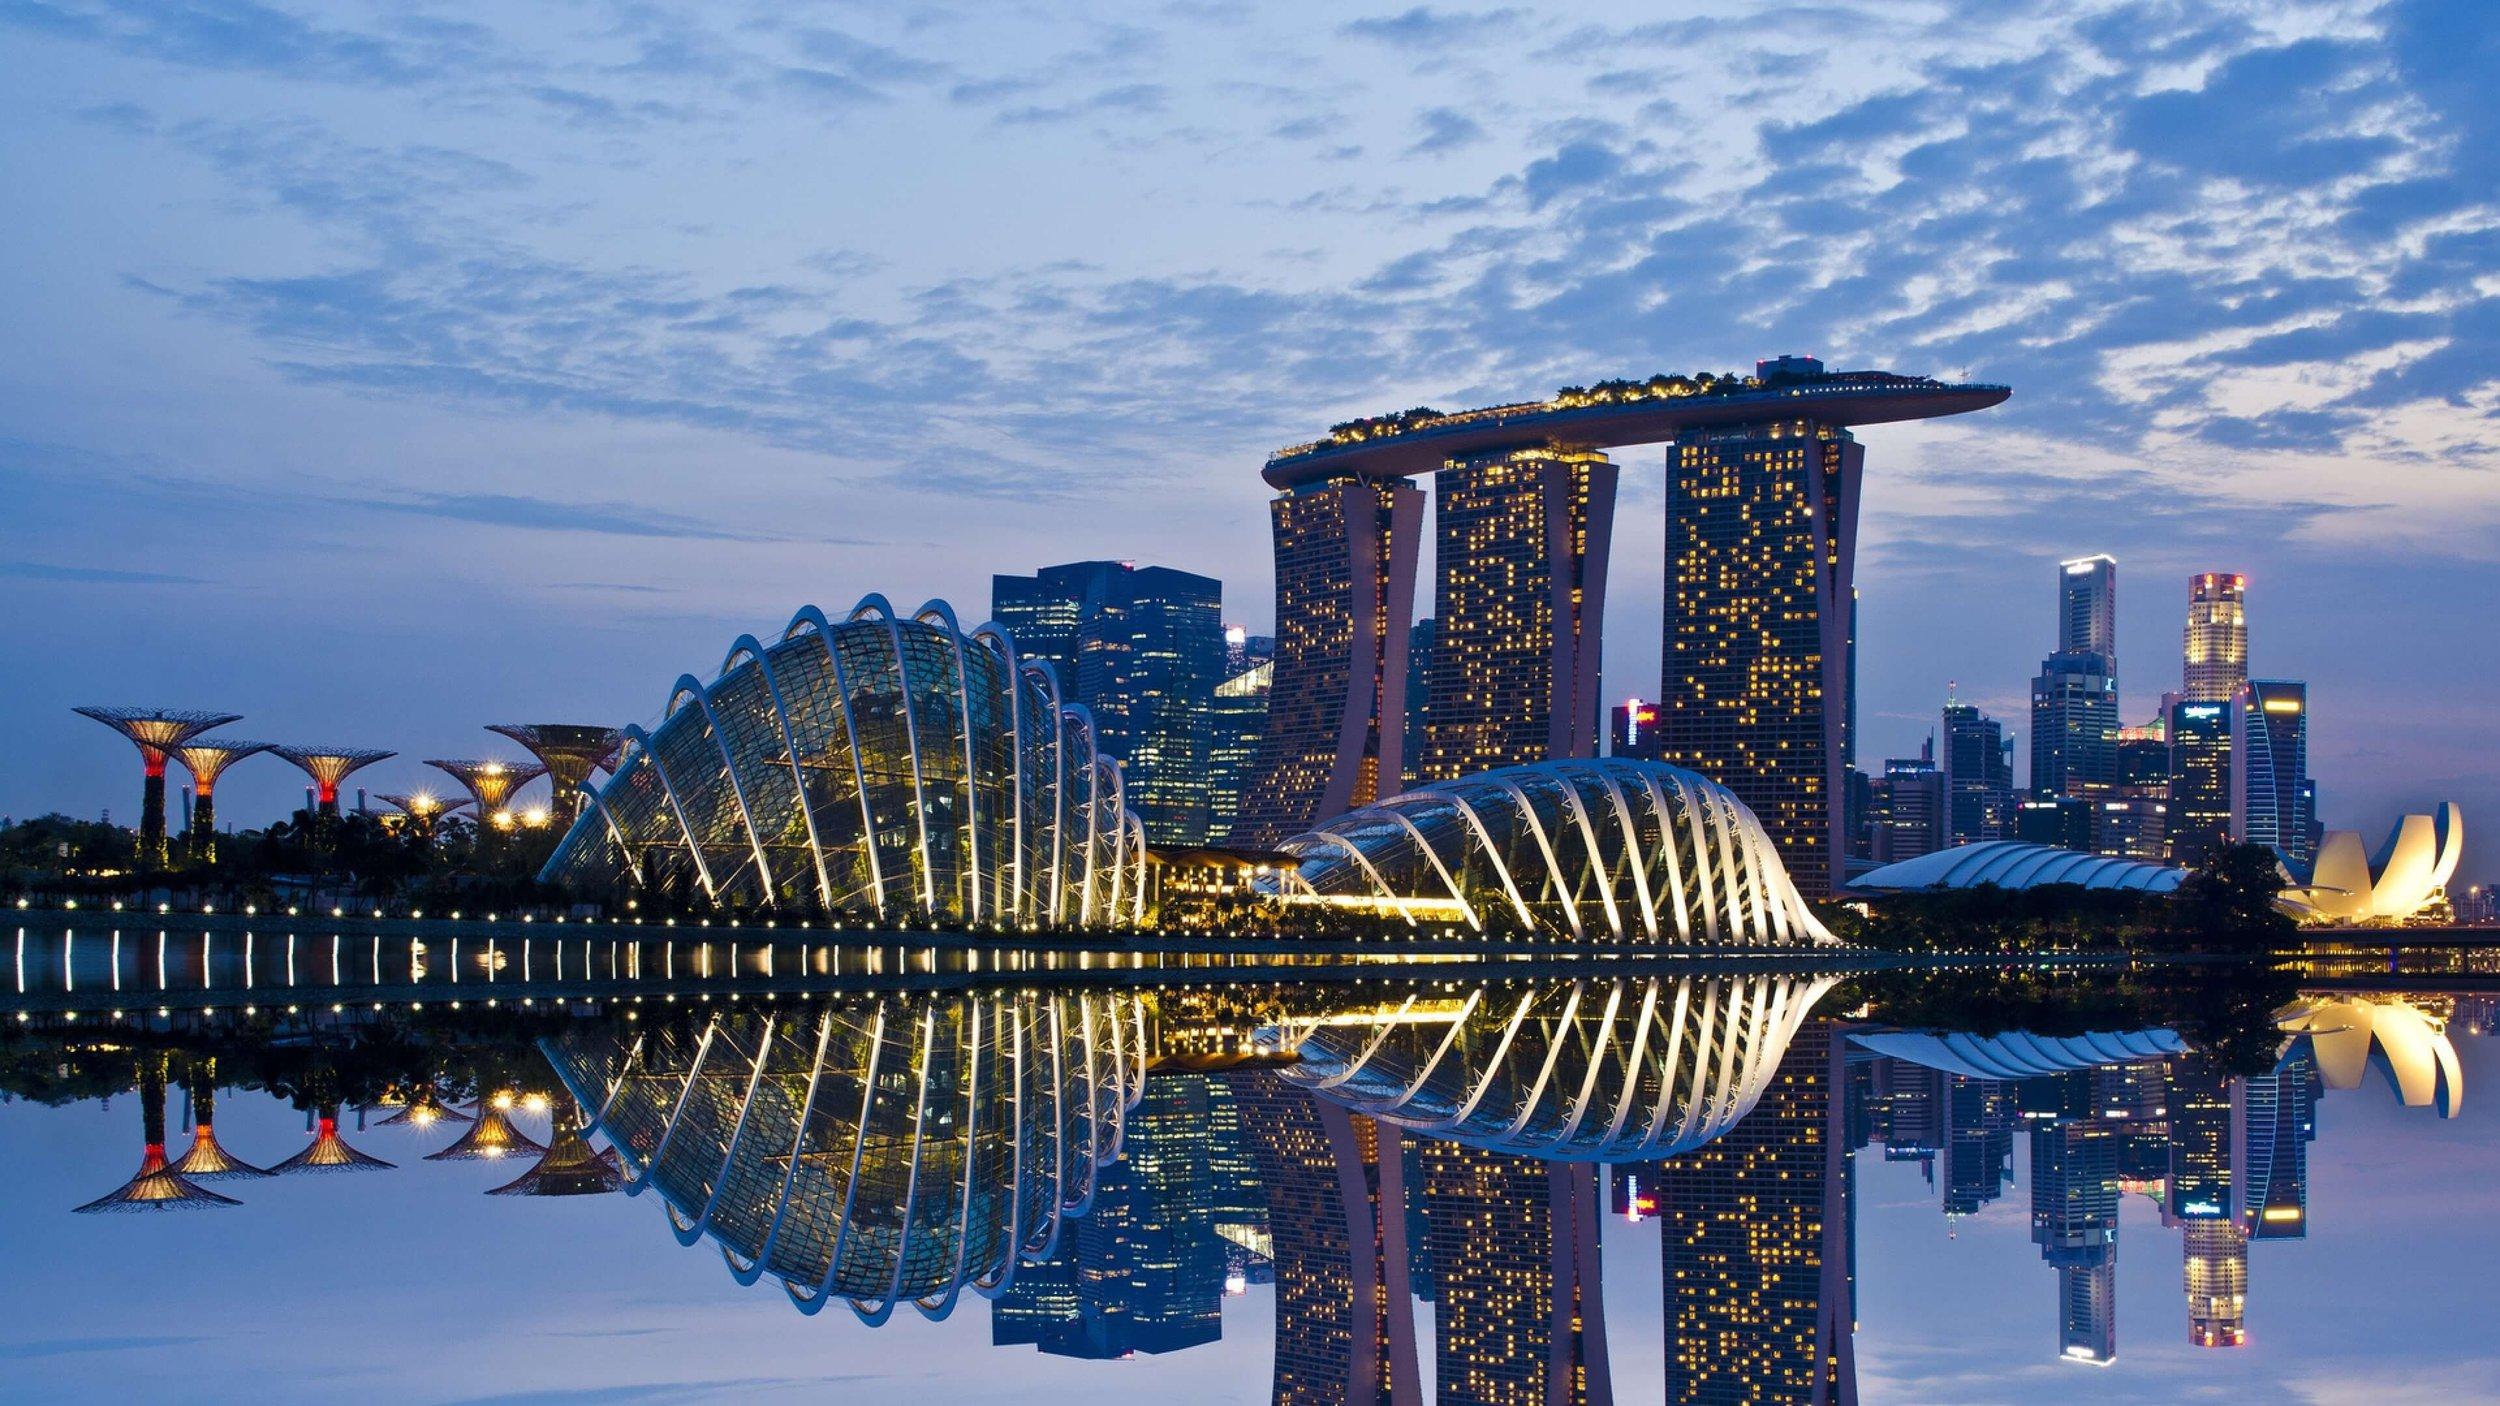 sights-and-scenes-of-beautiful-singapore-hd-wallpaper-7-3840x2160.jpg